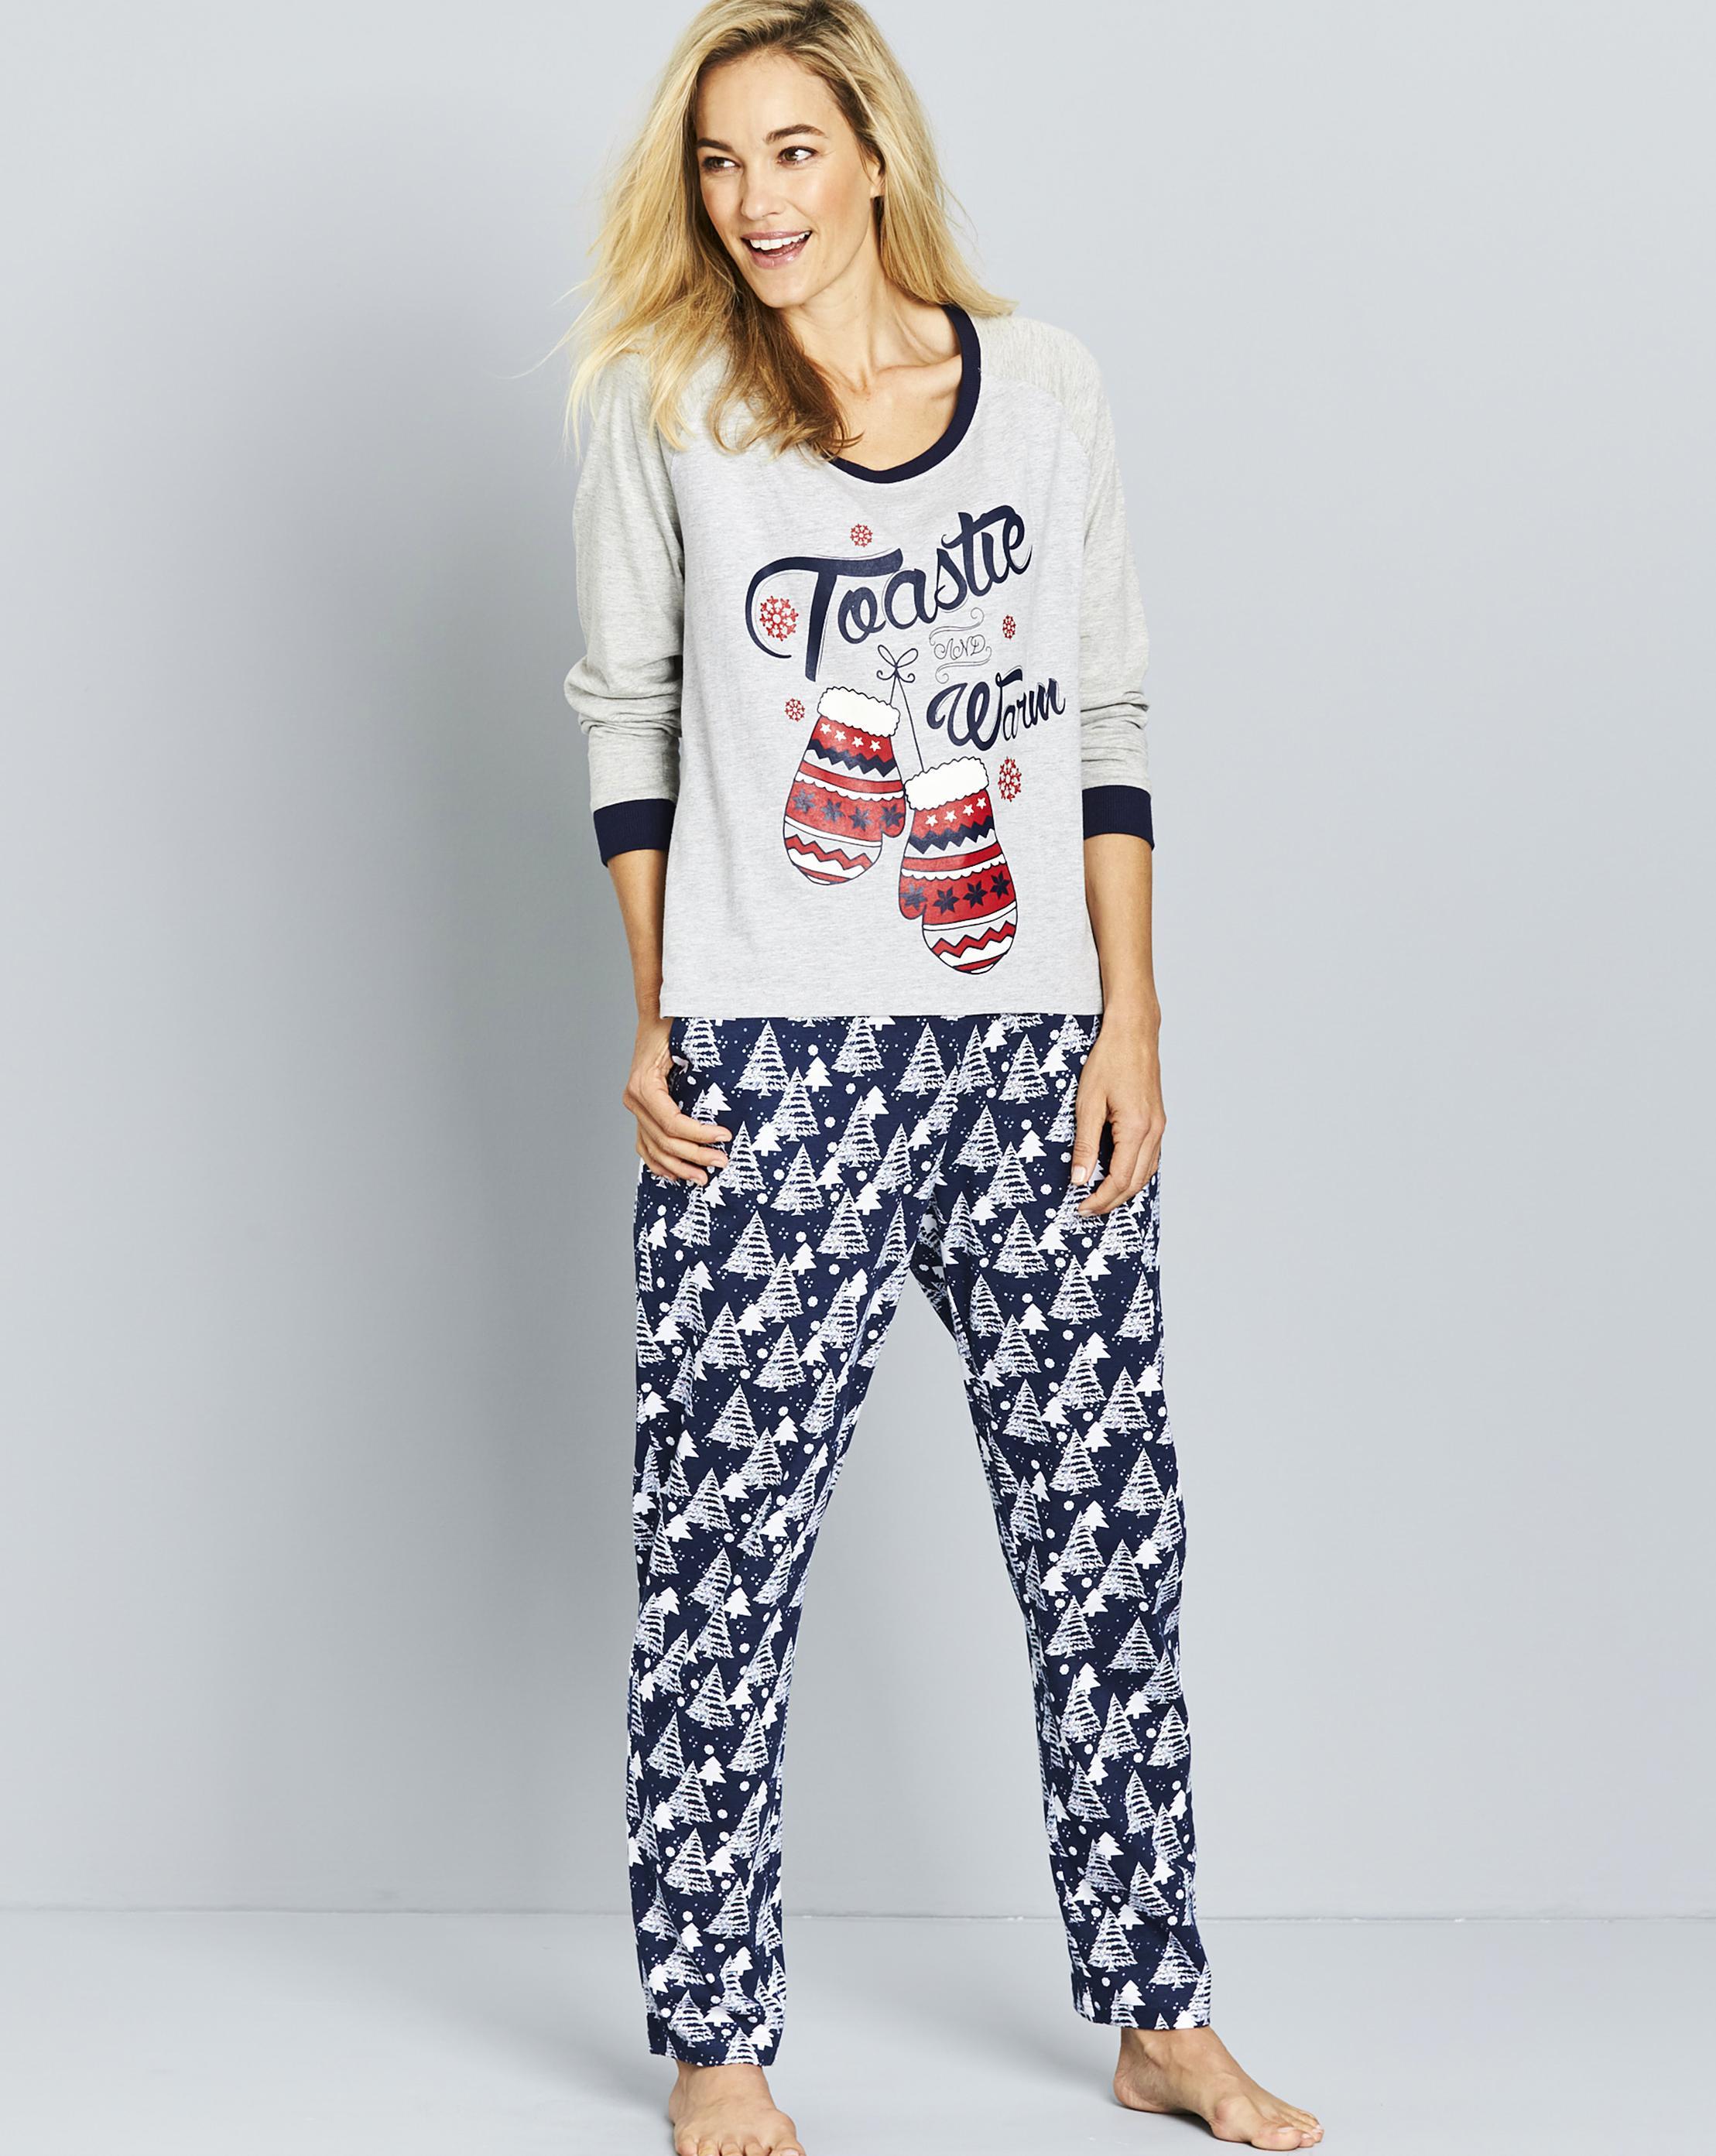 Lyst - Simply Be Pretty Secrets Snow Pajama Set in Gray deff1443e